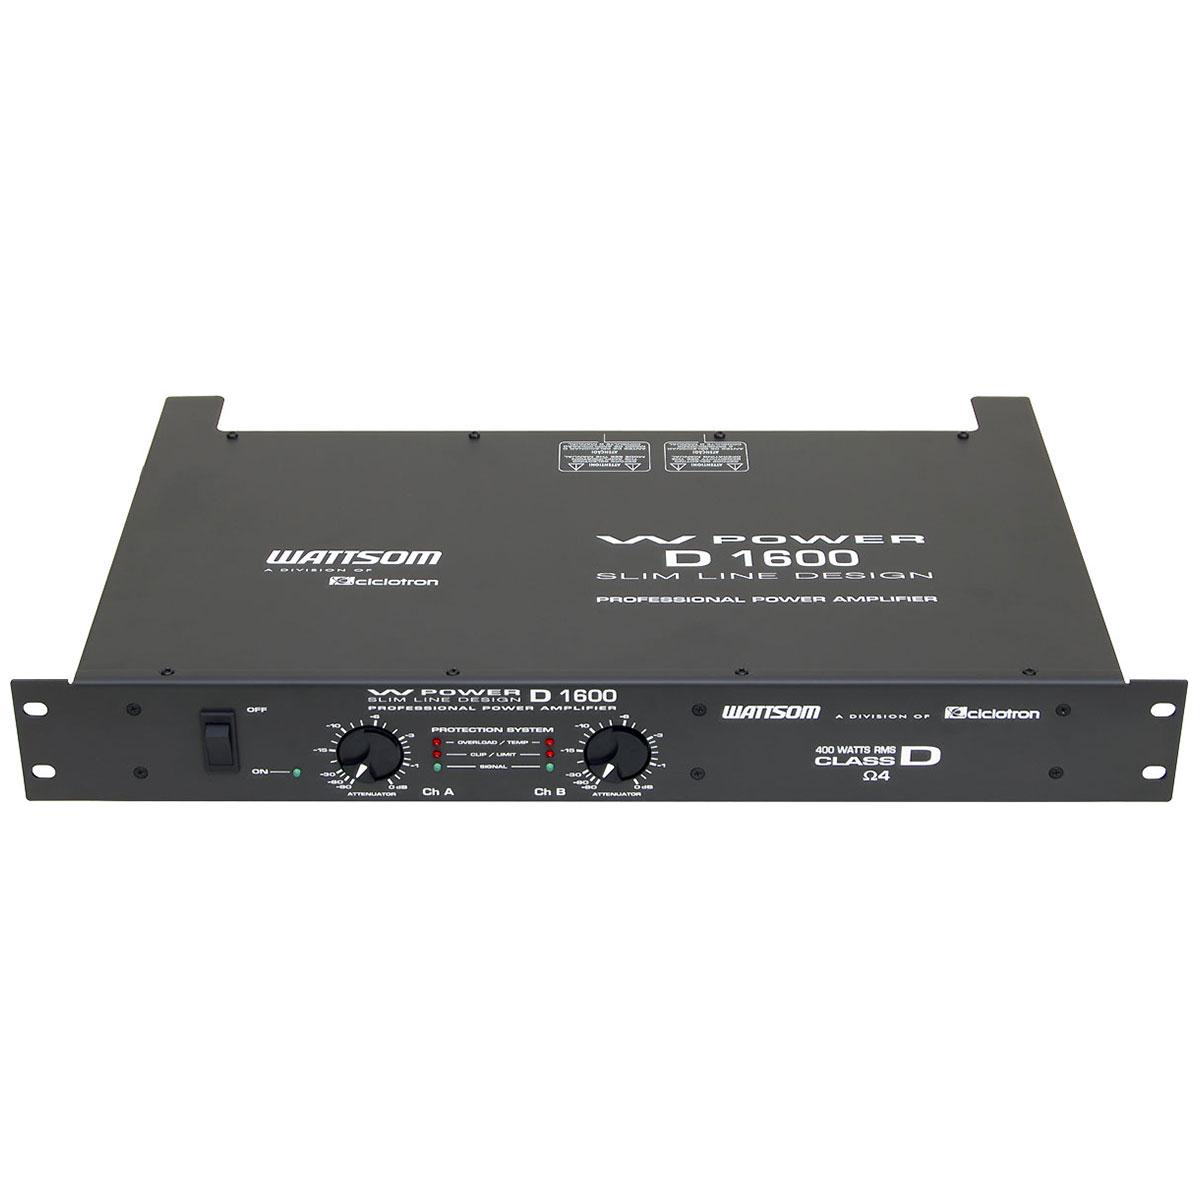 Amplificador de Potência 400W 4 Ohms - W Power D 1600 Ciclotron